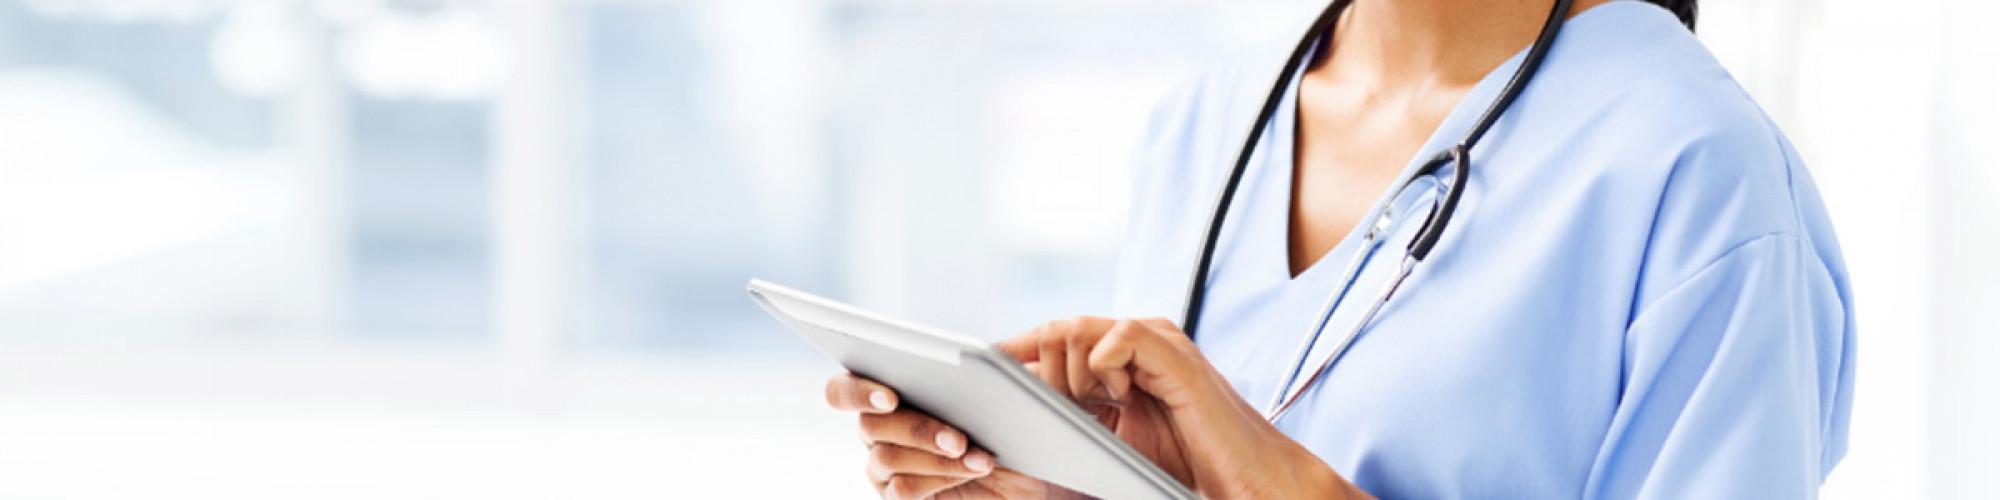 Precise Medical Staffing